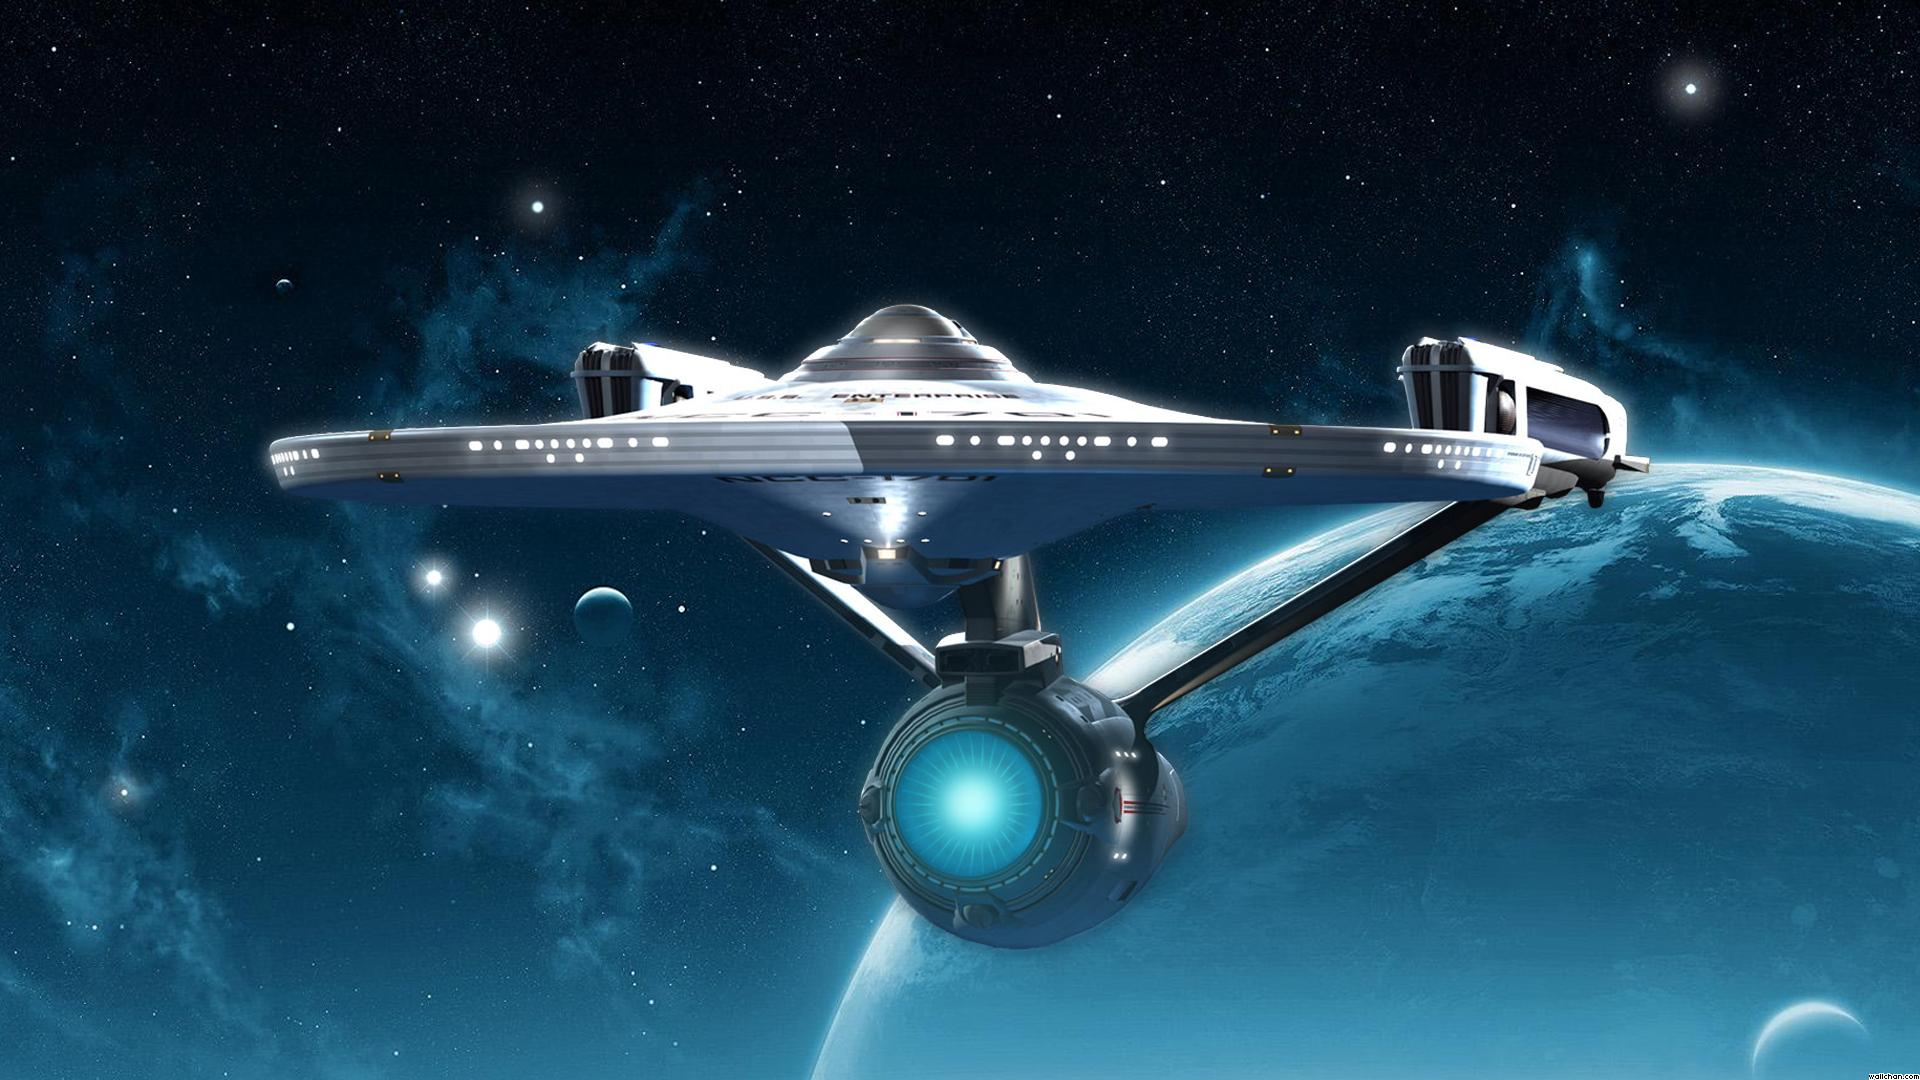 Star Trek Enterprise Wallpapers 1920x1080